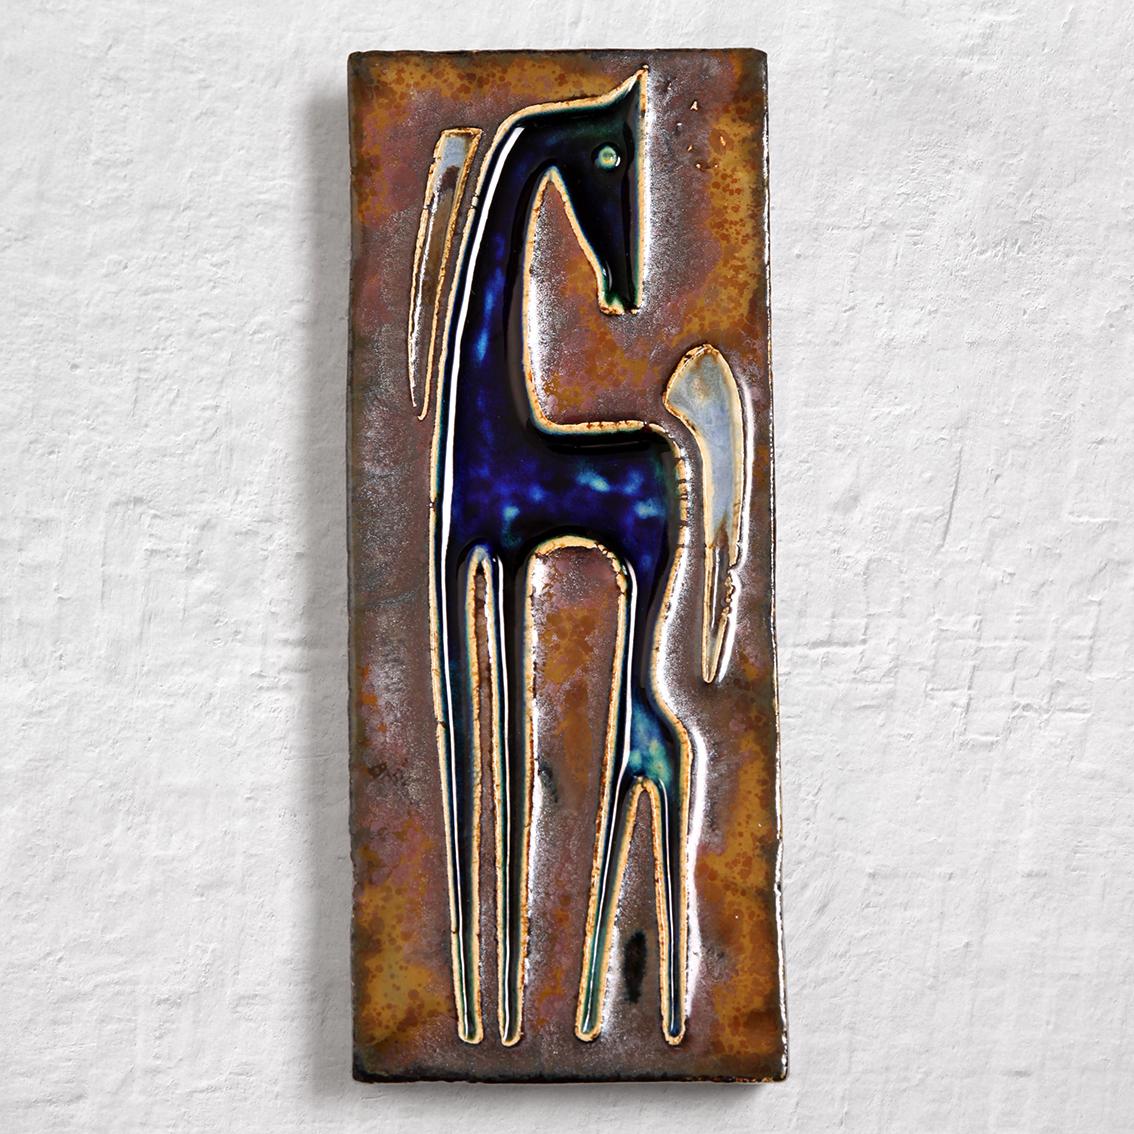 Helmut Schaffenacker ヘルムート シェーフェナッカー 青い馬の陶板 ヴィンテージ